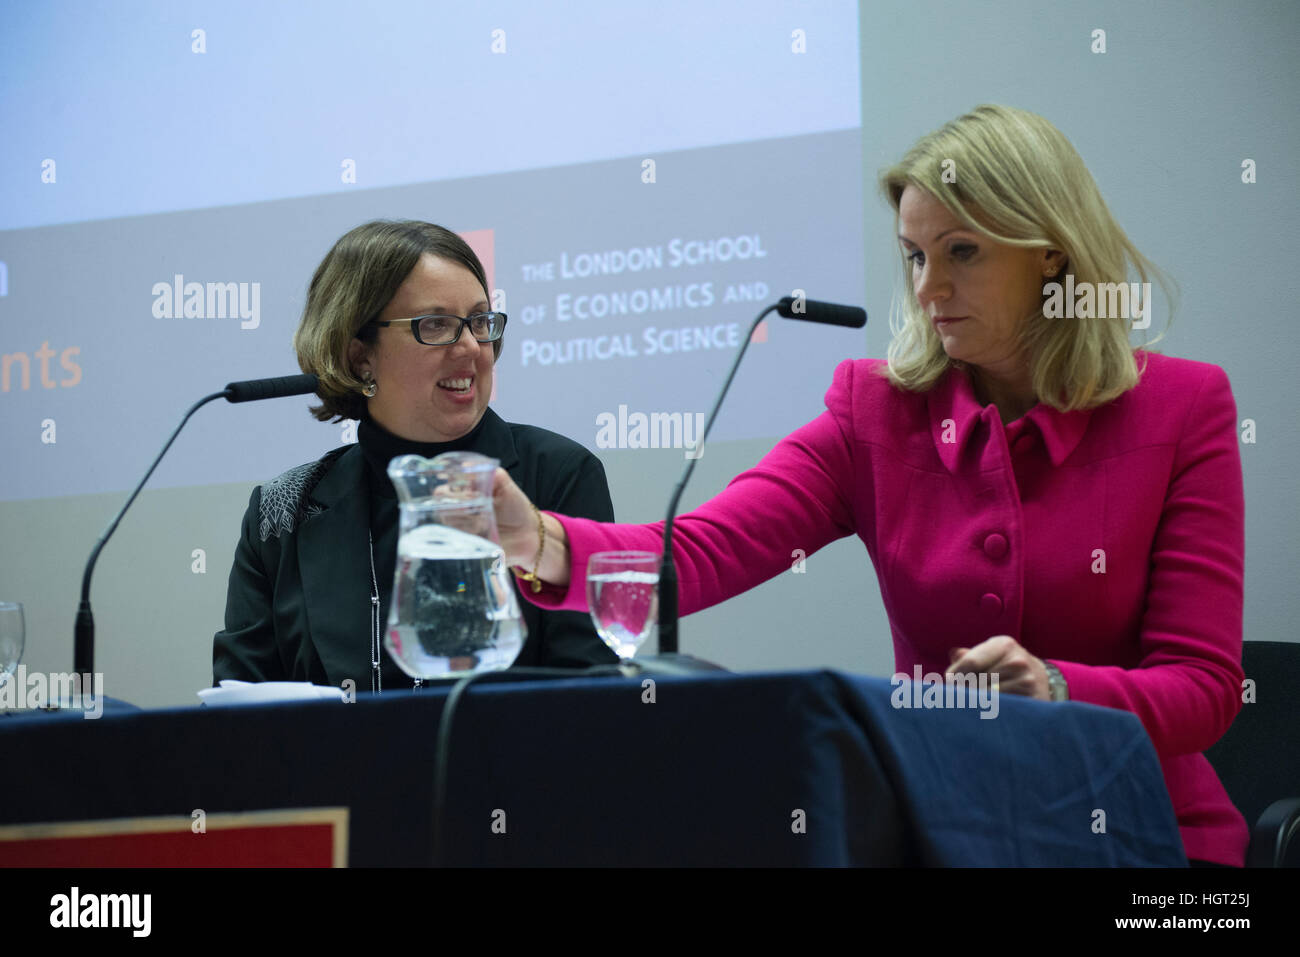 London, UK. 12th January 2017. Dr Jennifer Jackson Preece (L), Associate Professor of Nationalism in Europe at the - Stock Image